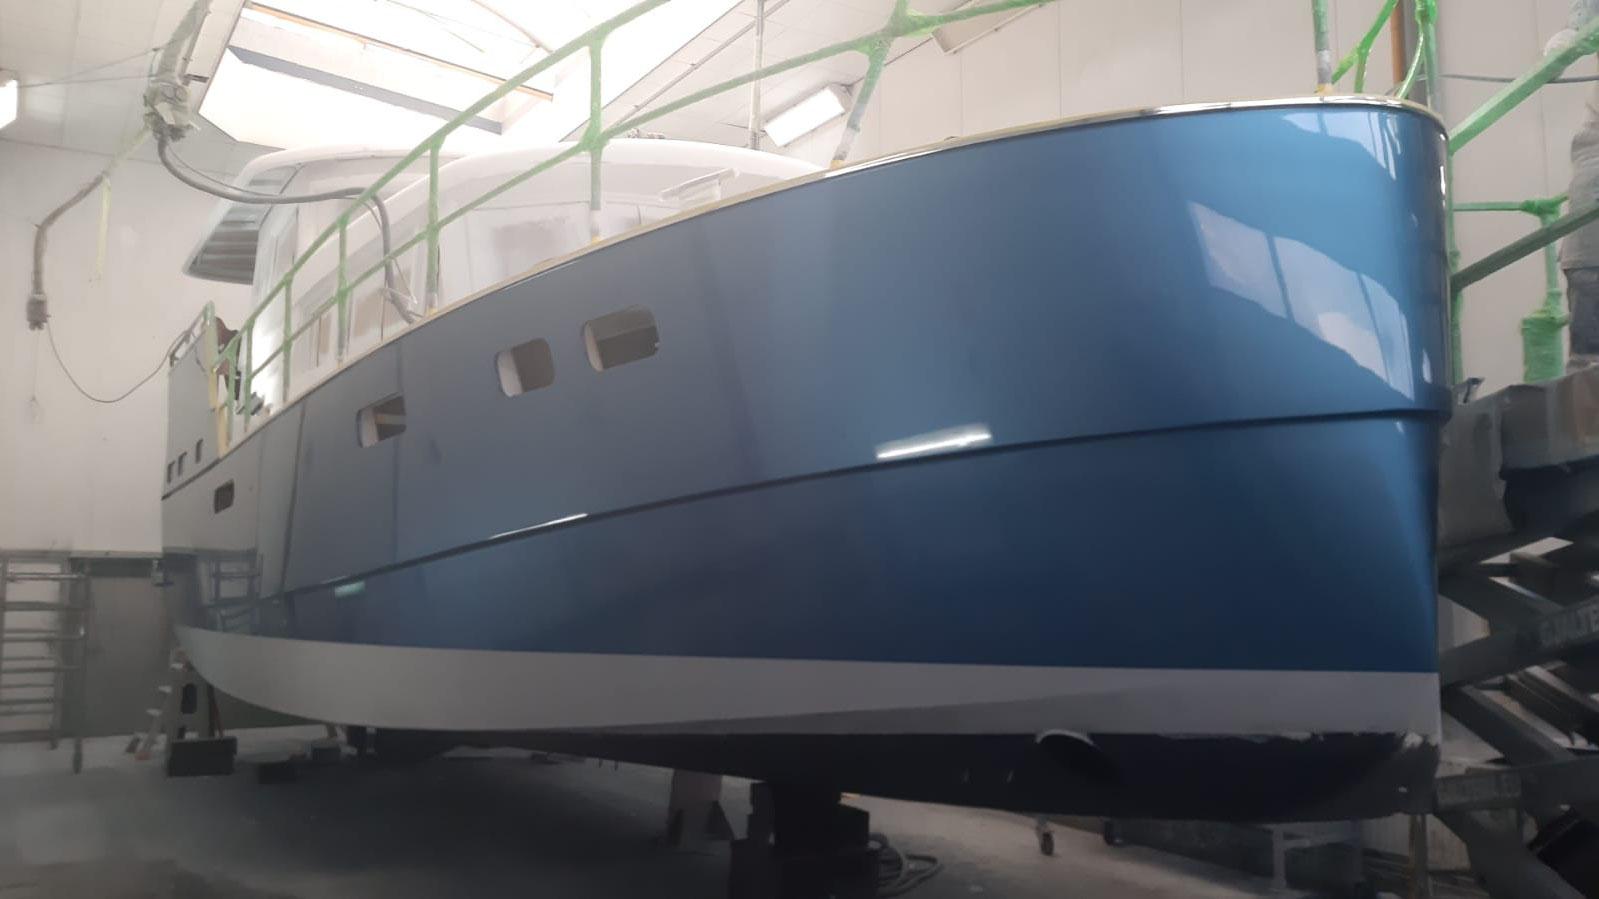 Aquanaut 400 AC/PH Lackierung Alexeal Dolphine Blue